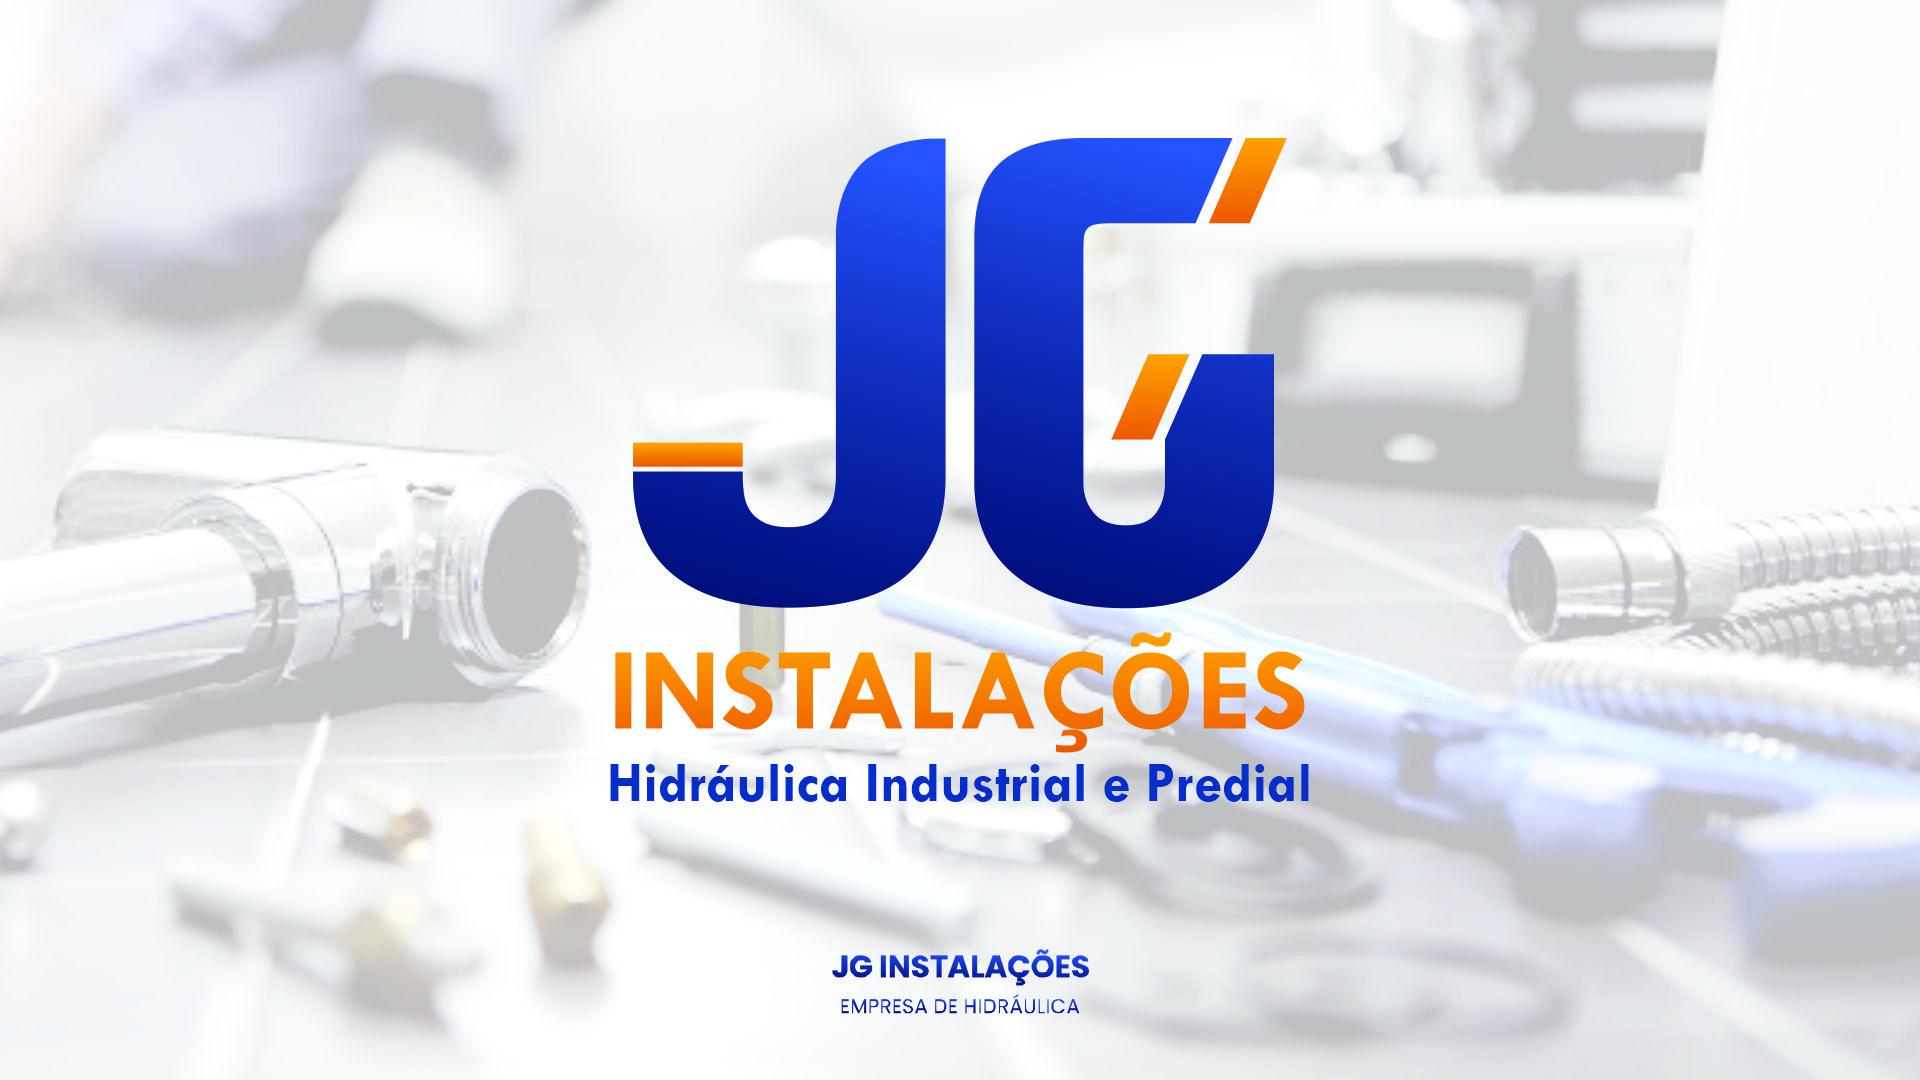 jg_instalacoes